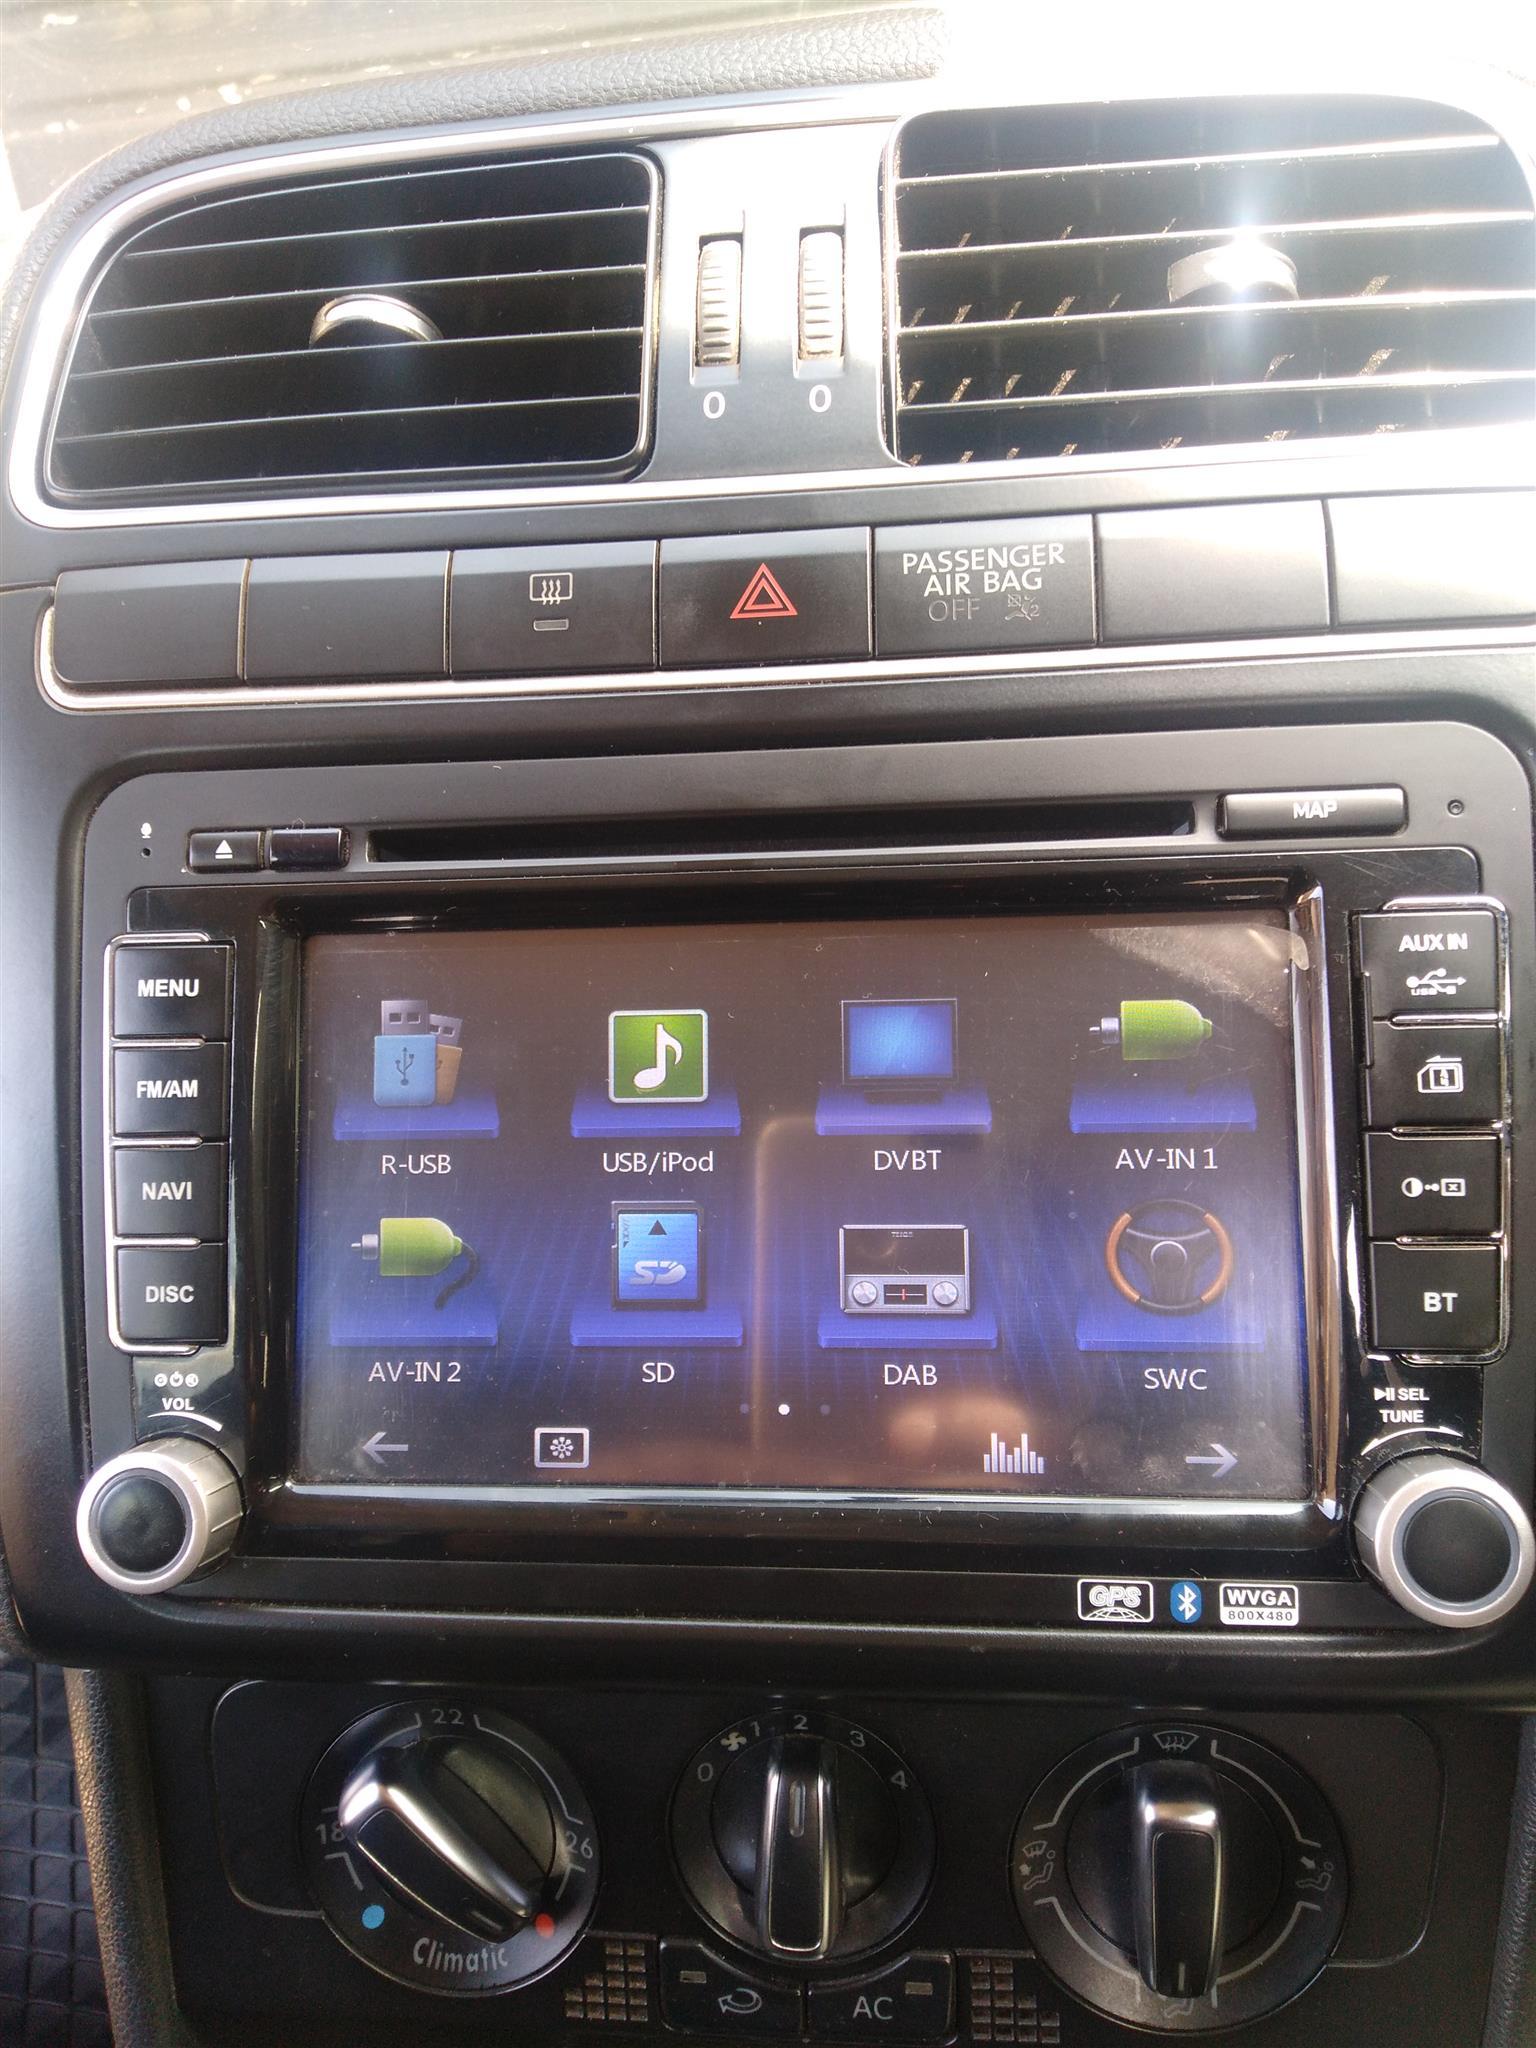 Touchscreen double din DVD radio, Amp, Limpid Speakers